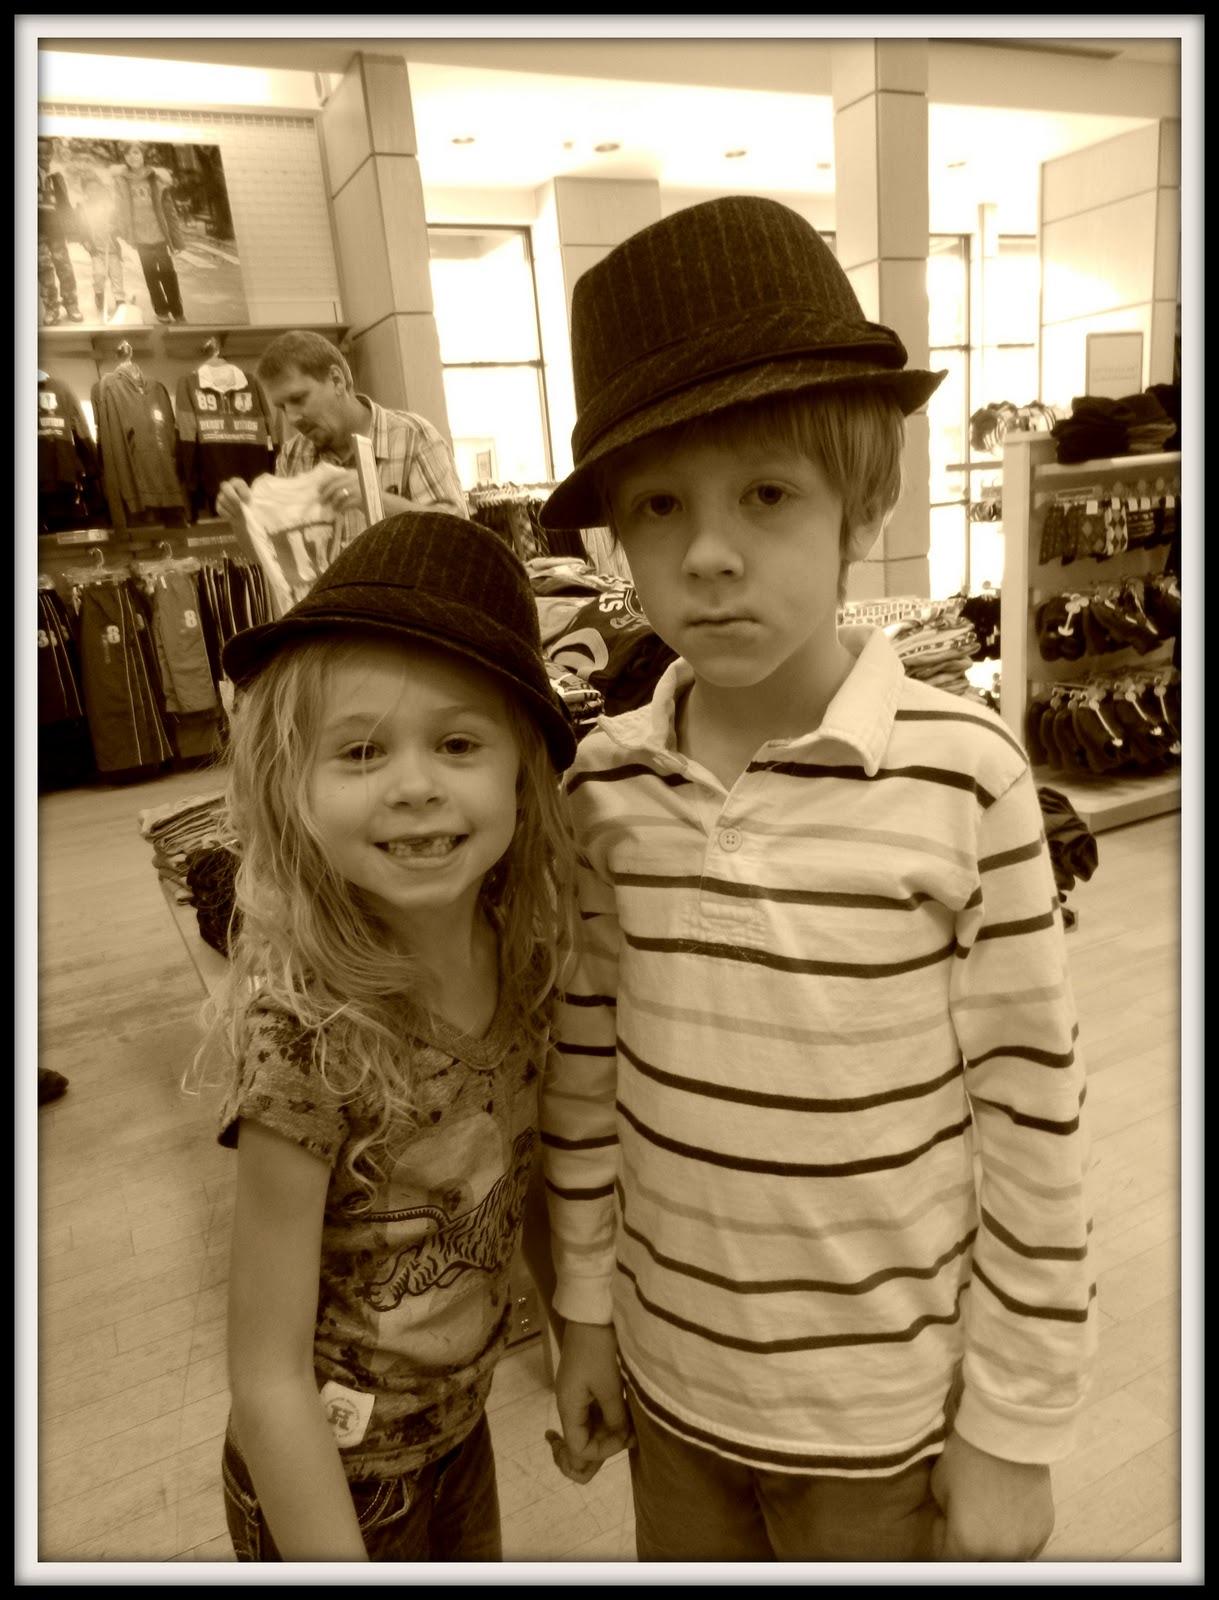 6b966-hats.jpg